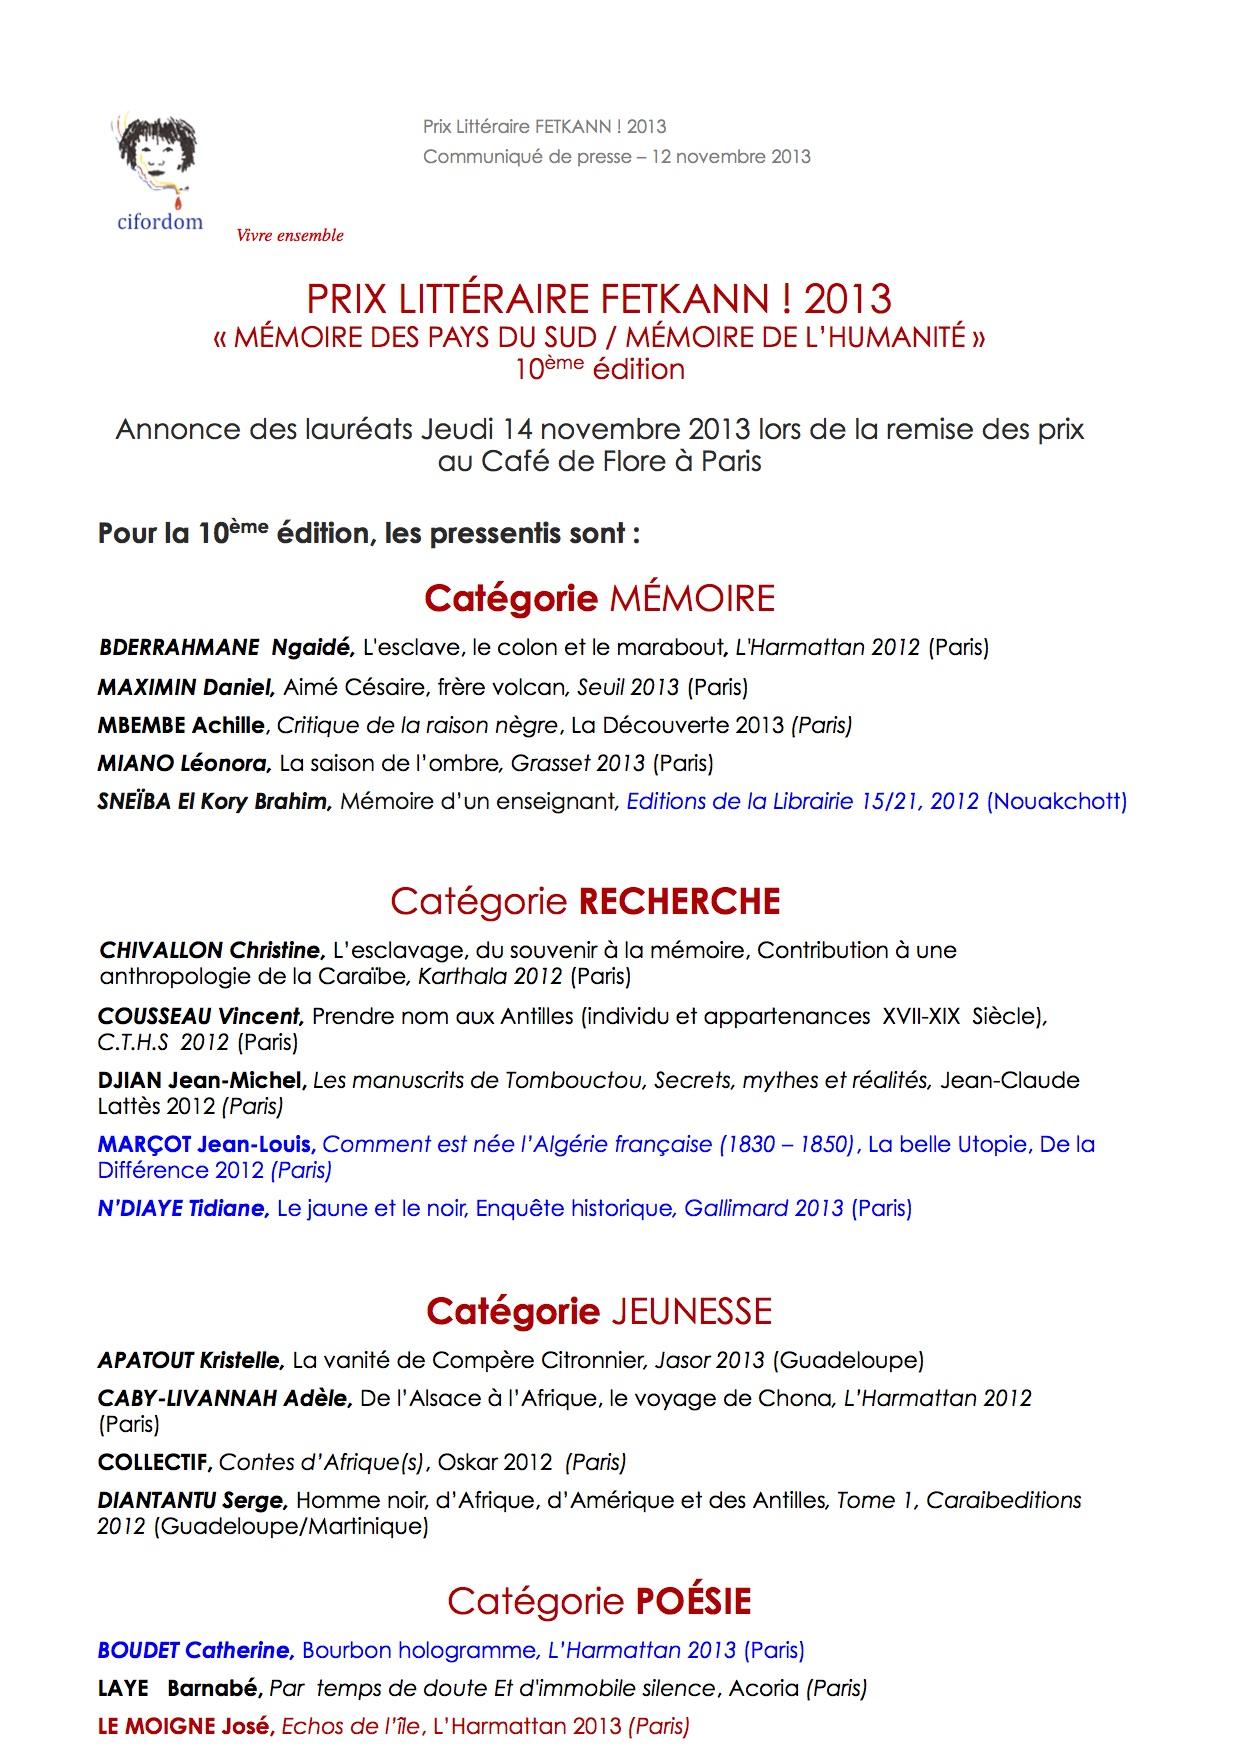 CP Prix_FETKANN_les pressentis_2013-1